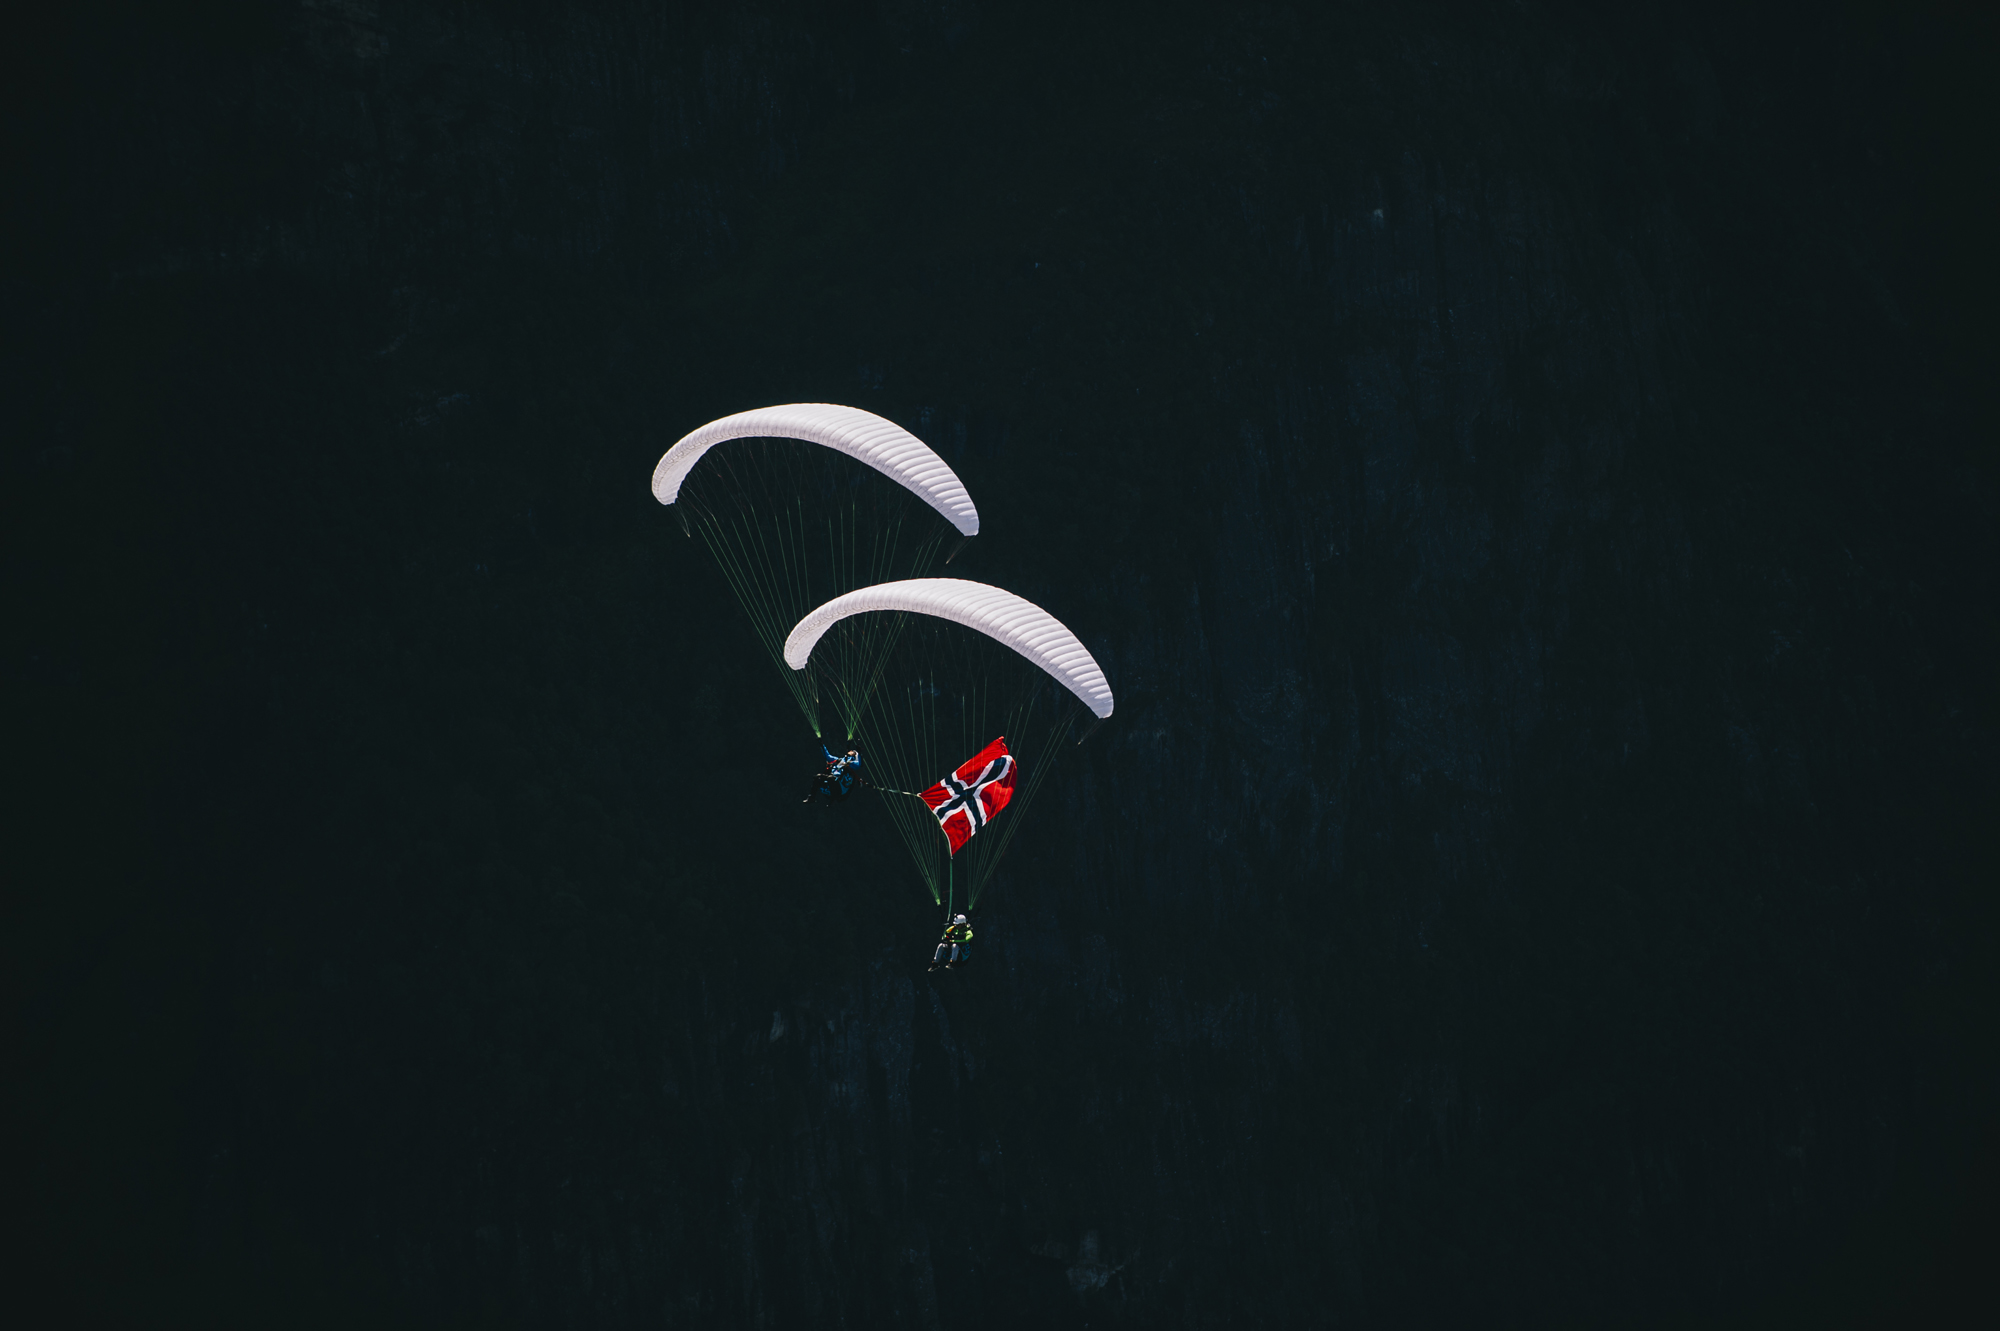 Norway Flag paragliding down plane Francois Ragolski Martin Schricke Gudvengen Picx by Emil Sollie 2